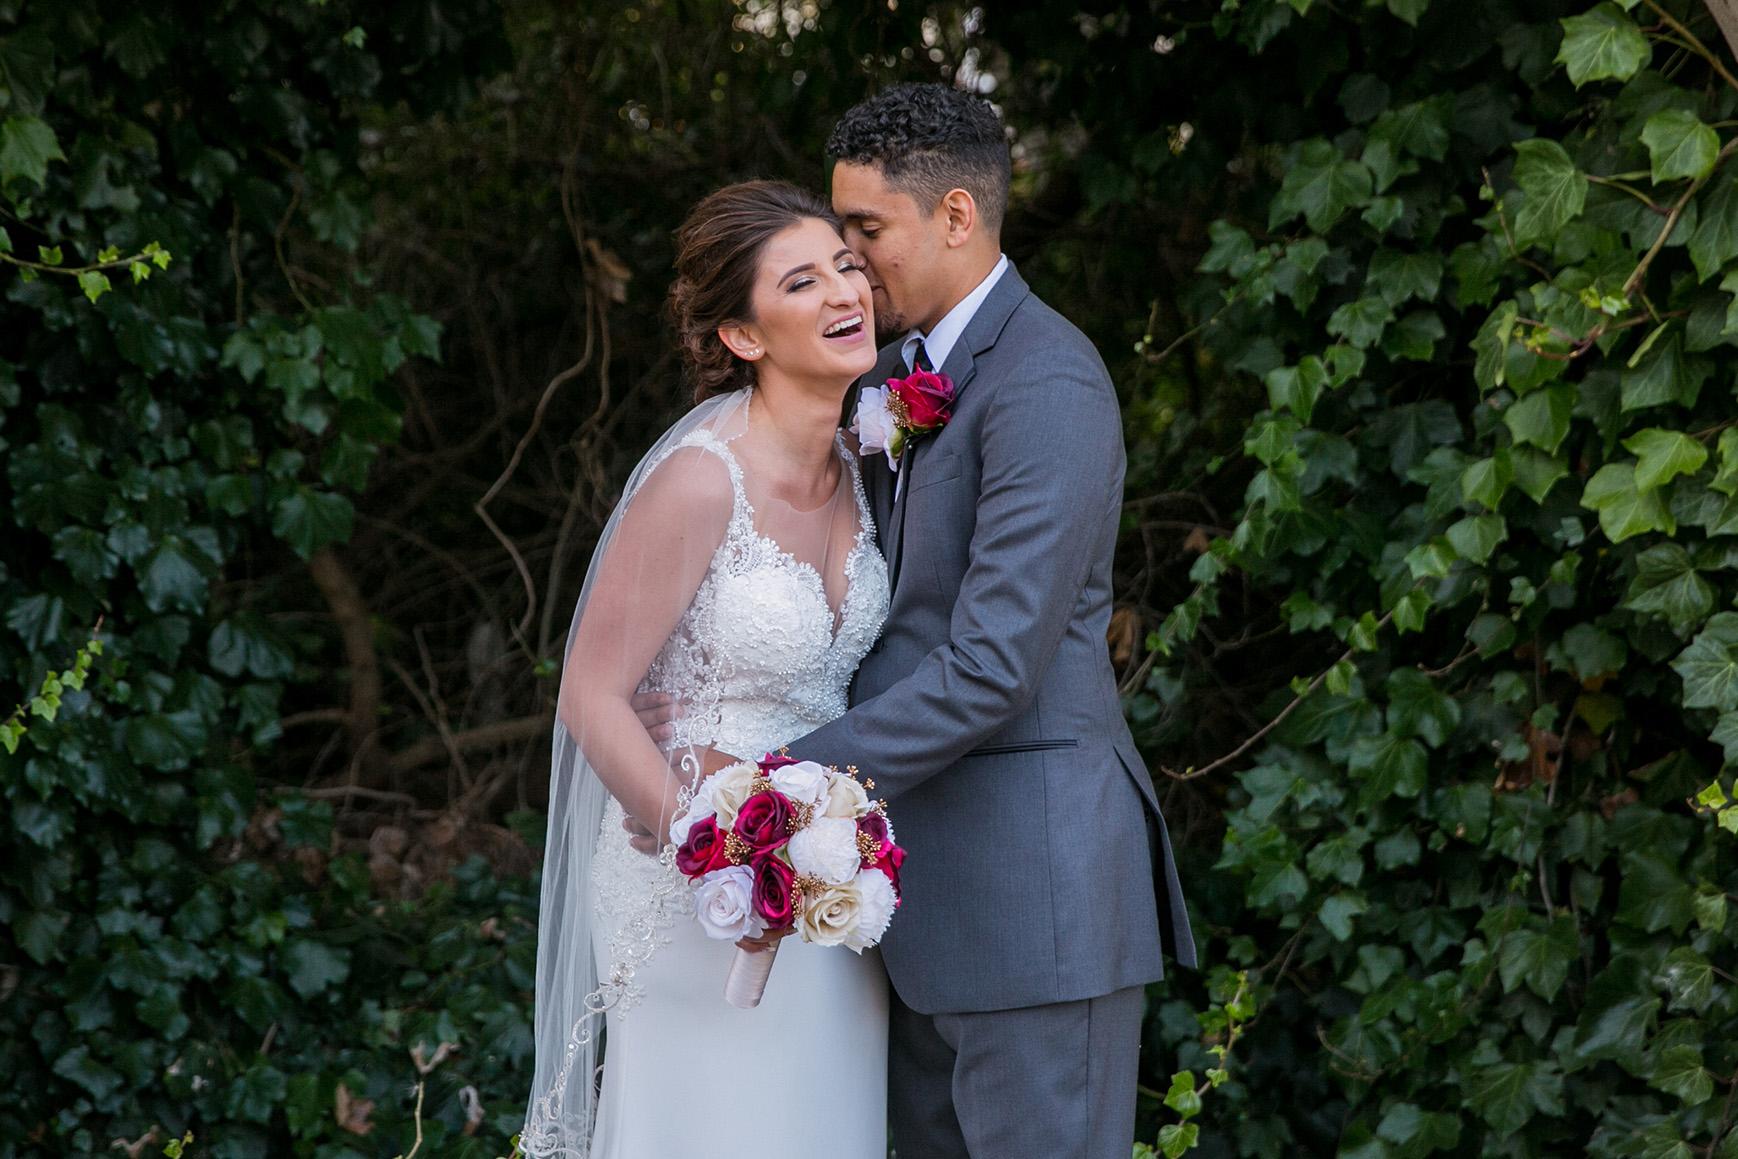 Beautiful photo opportunities on the nature preserve - Carmel - Carmel, California - Monterey County - Wedgewood Weddings